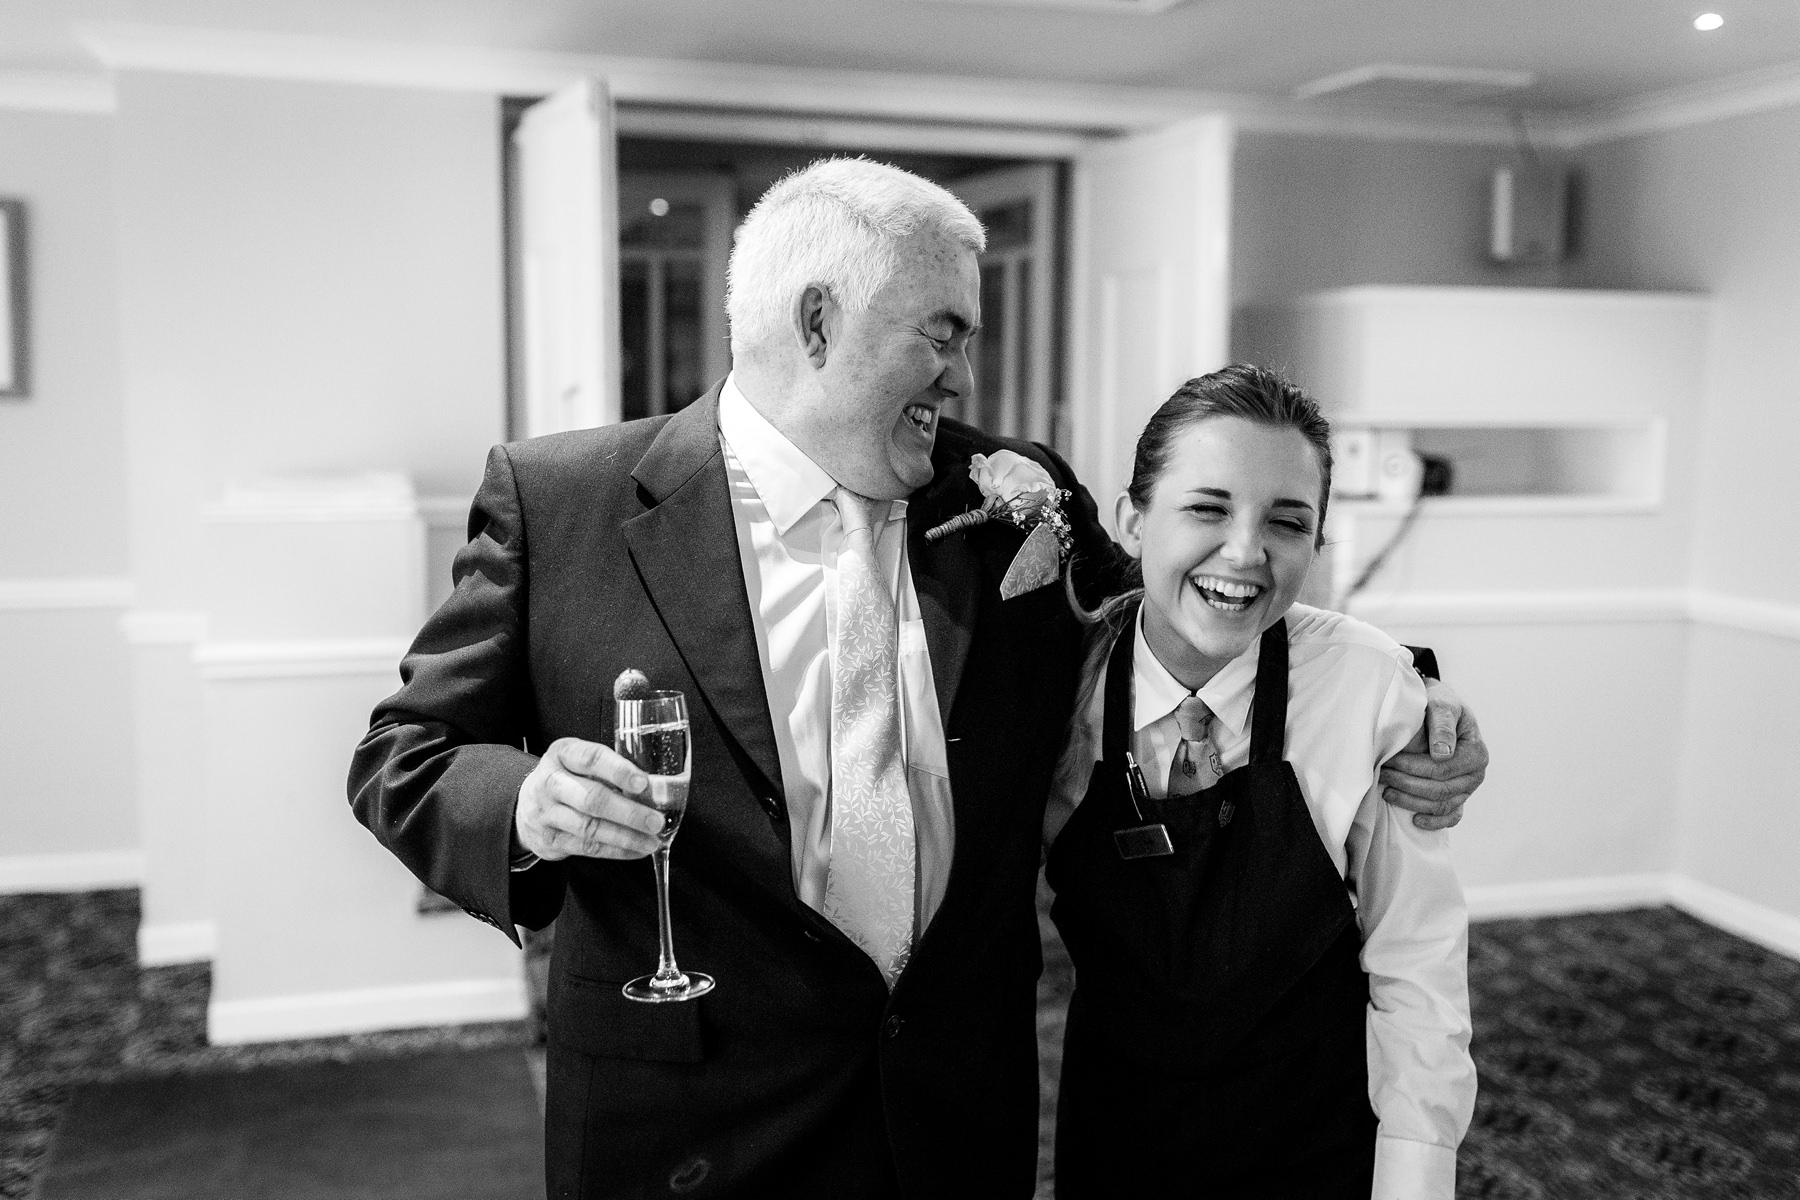 intimate-wedding-at-kilhey-court-lancashire-photographer_0015.jpg